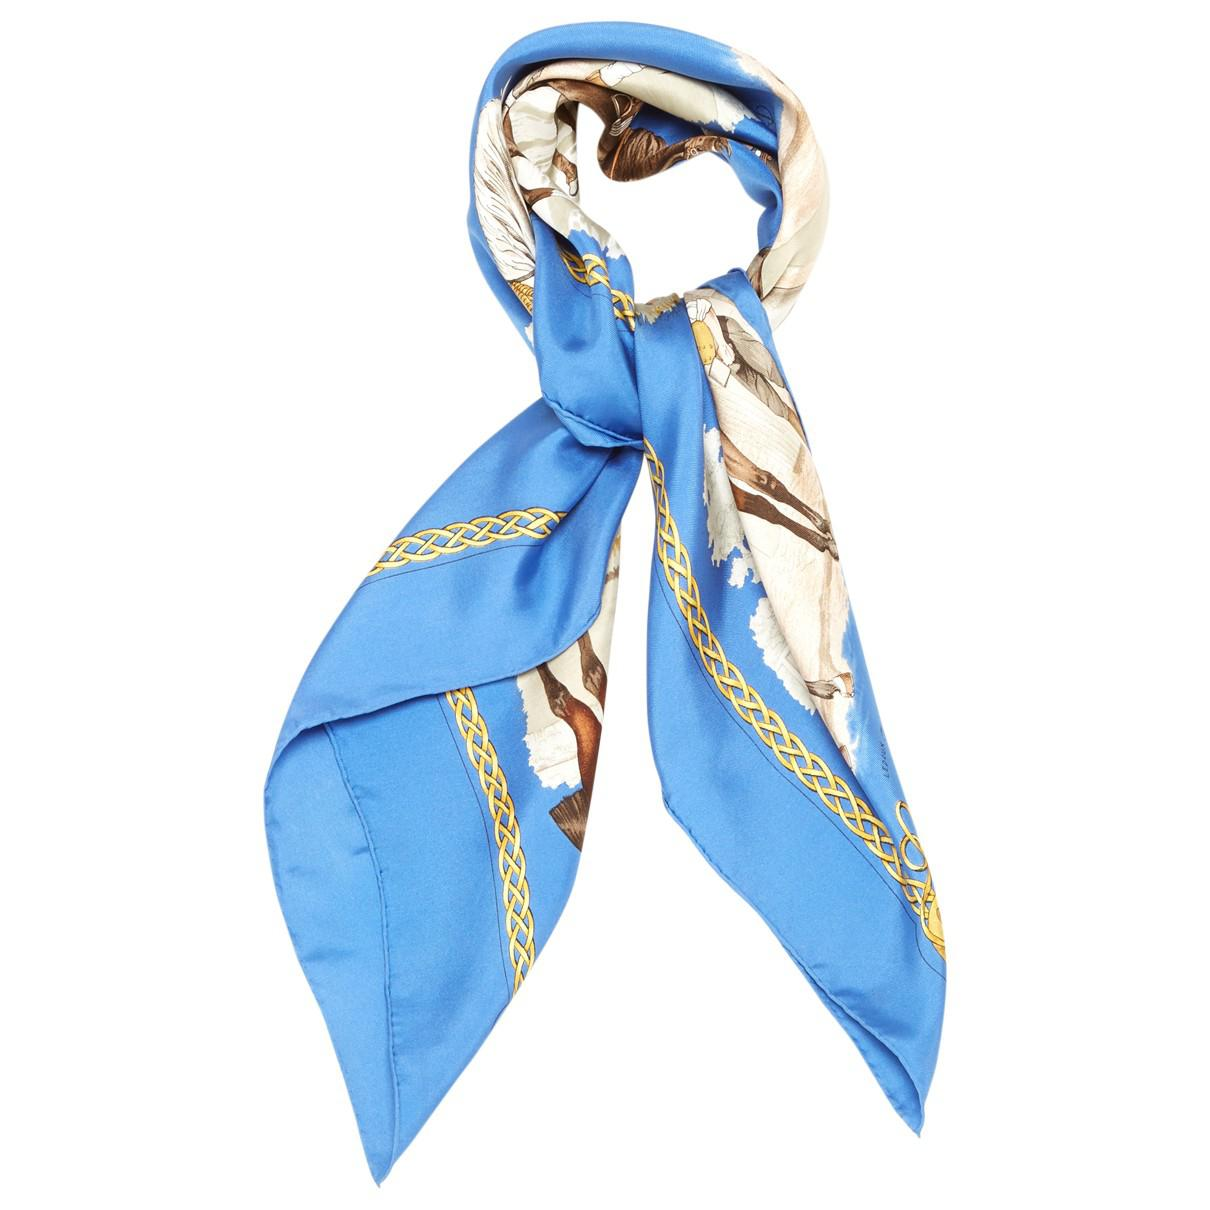 Lyst - Hermès Pre-owned Carré Silk Neckerchief in Blue 34490bbc0bc